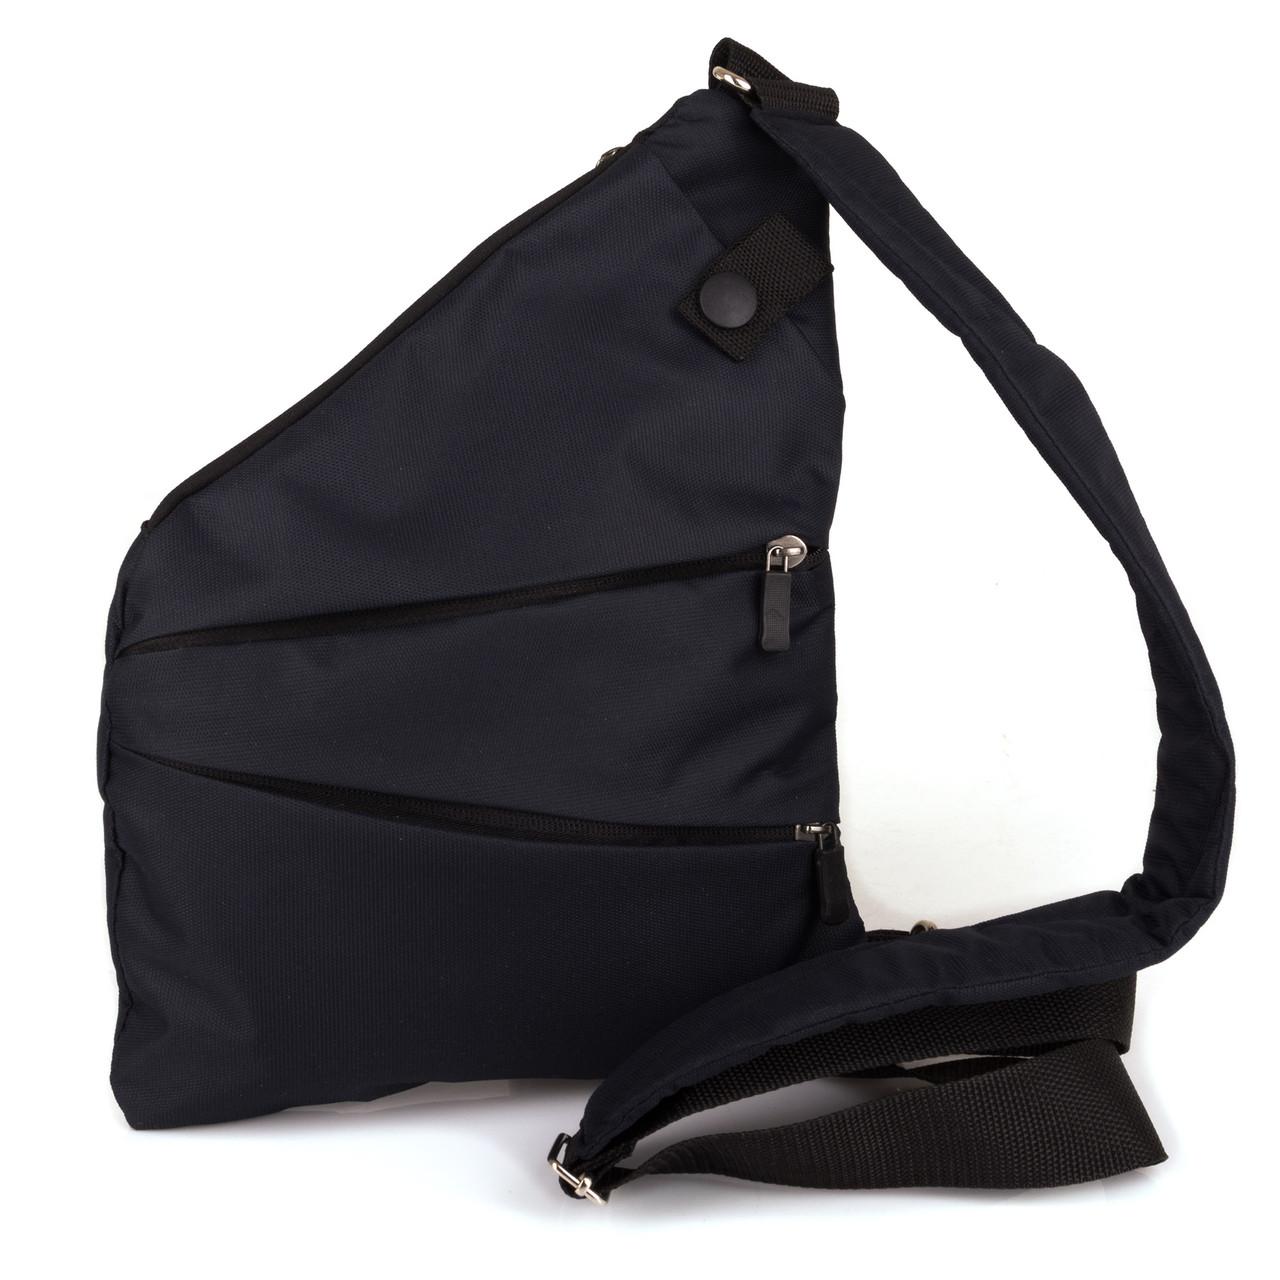 f8396fde8383 Мужская сумка-кобура Lerom M200 dark blue, цена 150 грн., купить ...